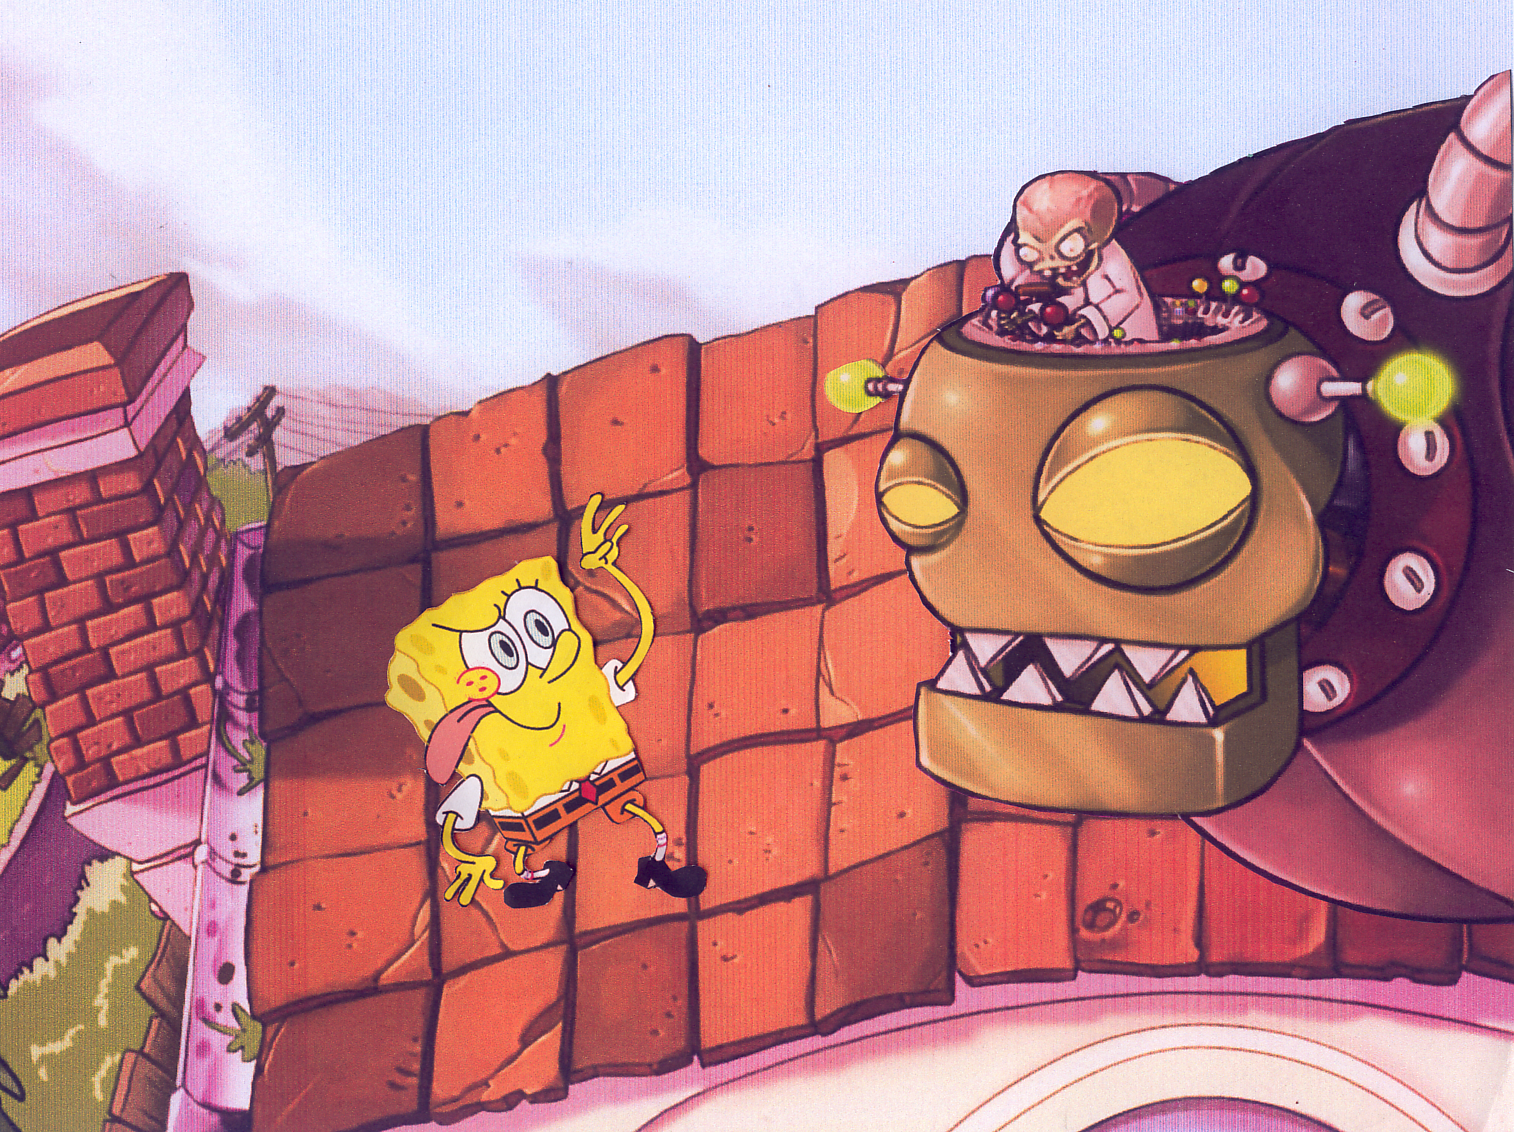 spongebob vs ollantay center for the arts an mugen request 482 new spongebob vs old spongebob double match